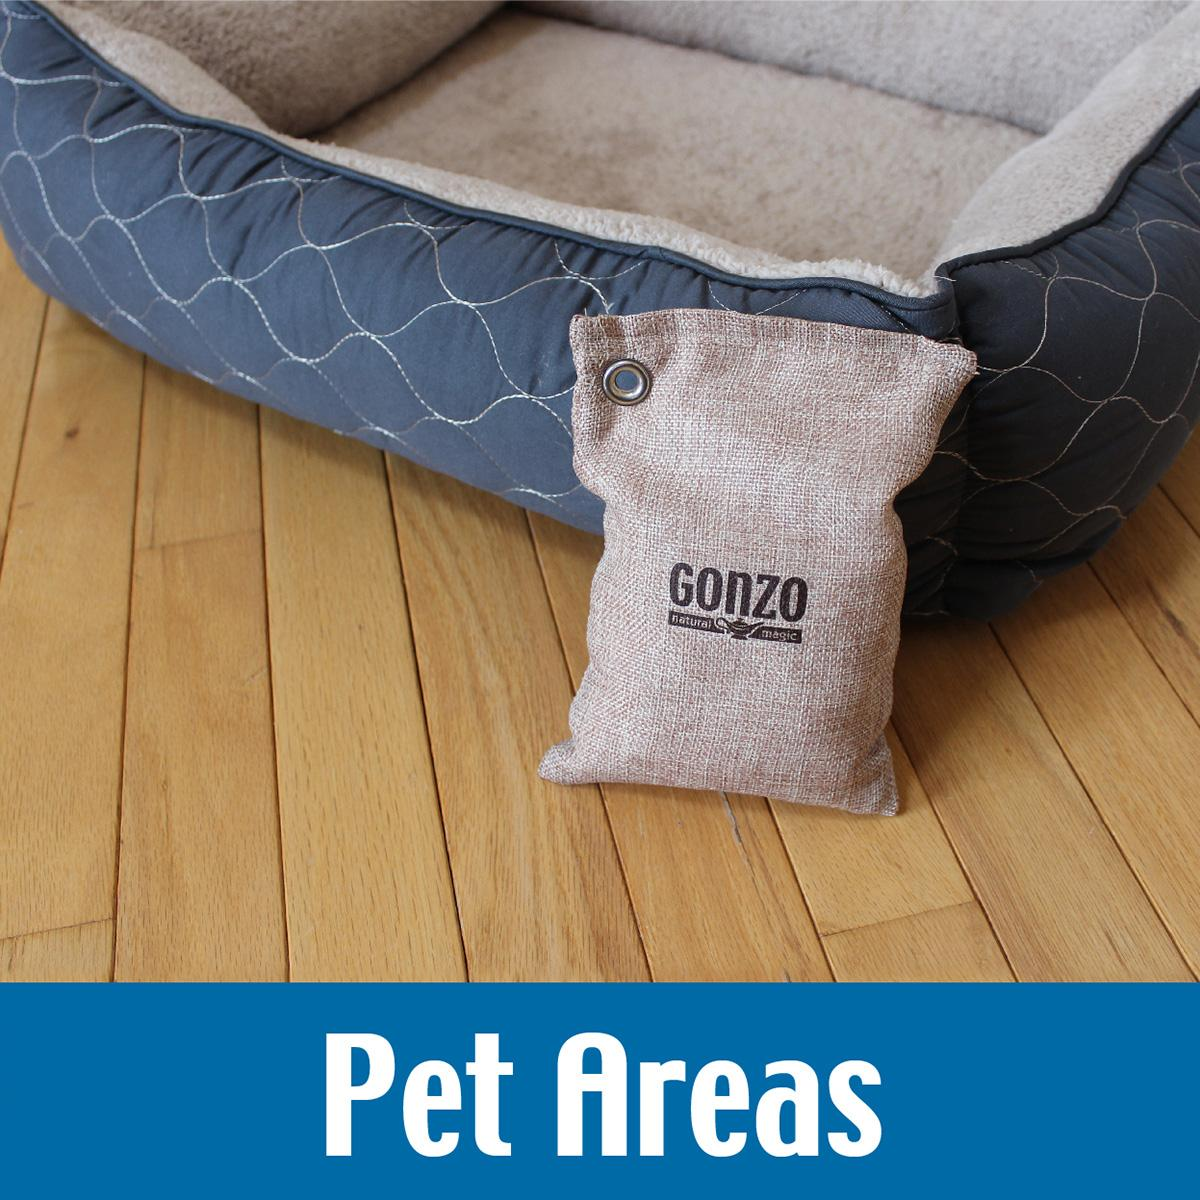 Gym Bag Odor: Gonzo Reusable Air Freshener